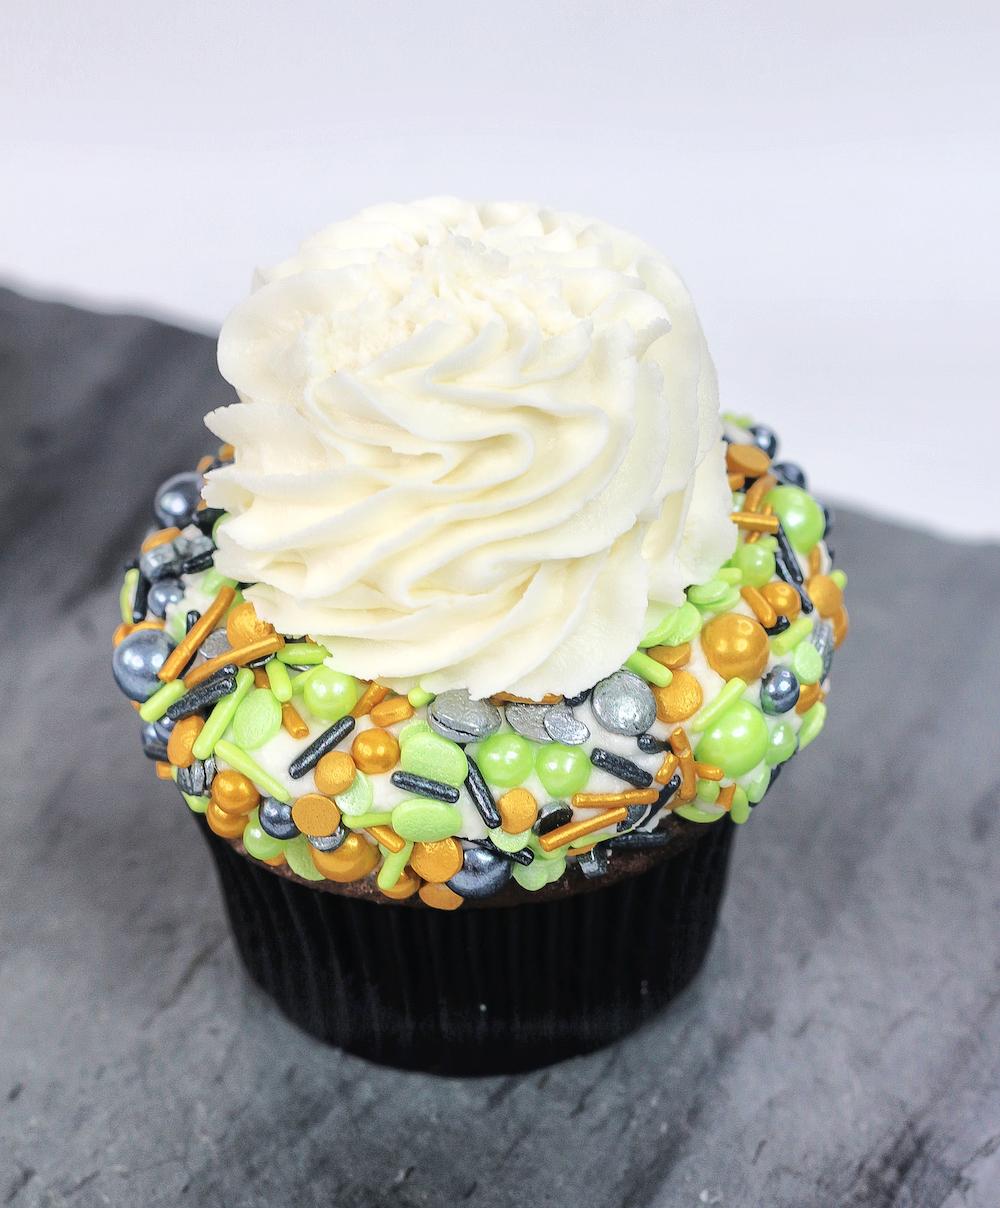 Loki Cupcake Step 1 add frosting and sprinkles